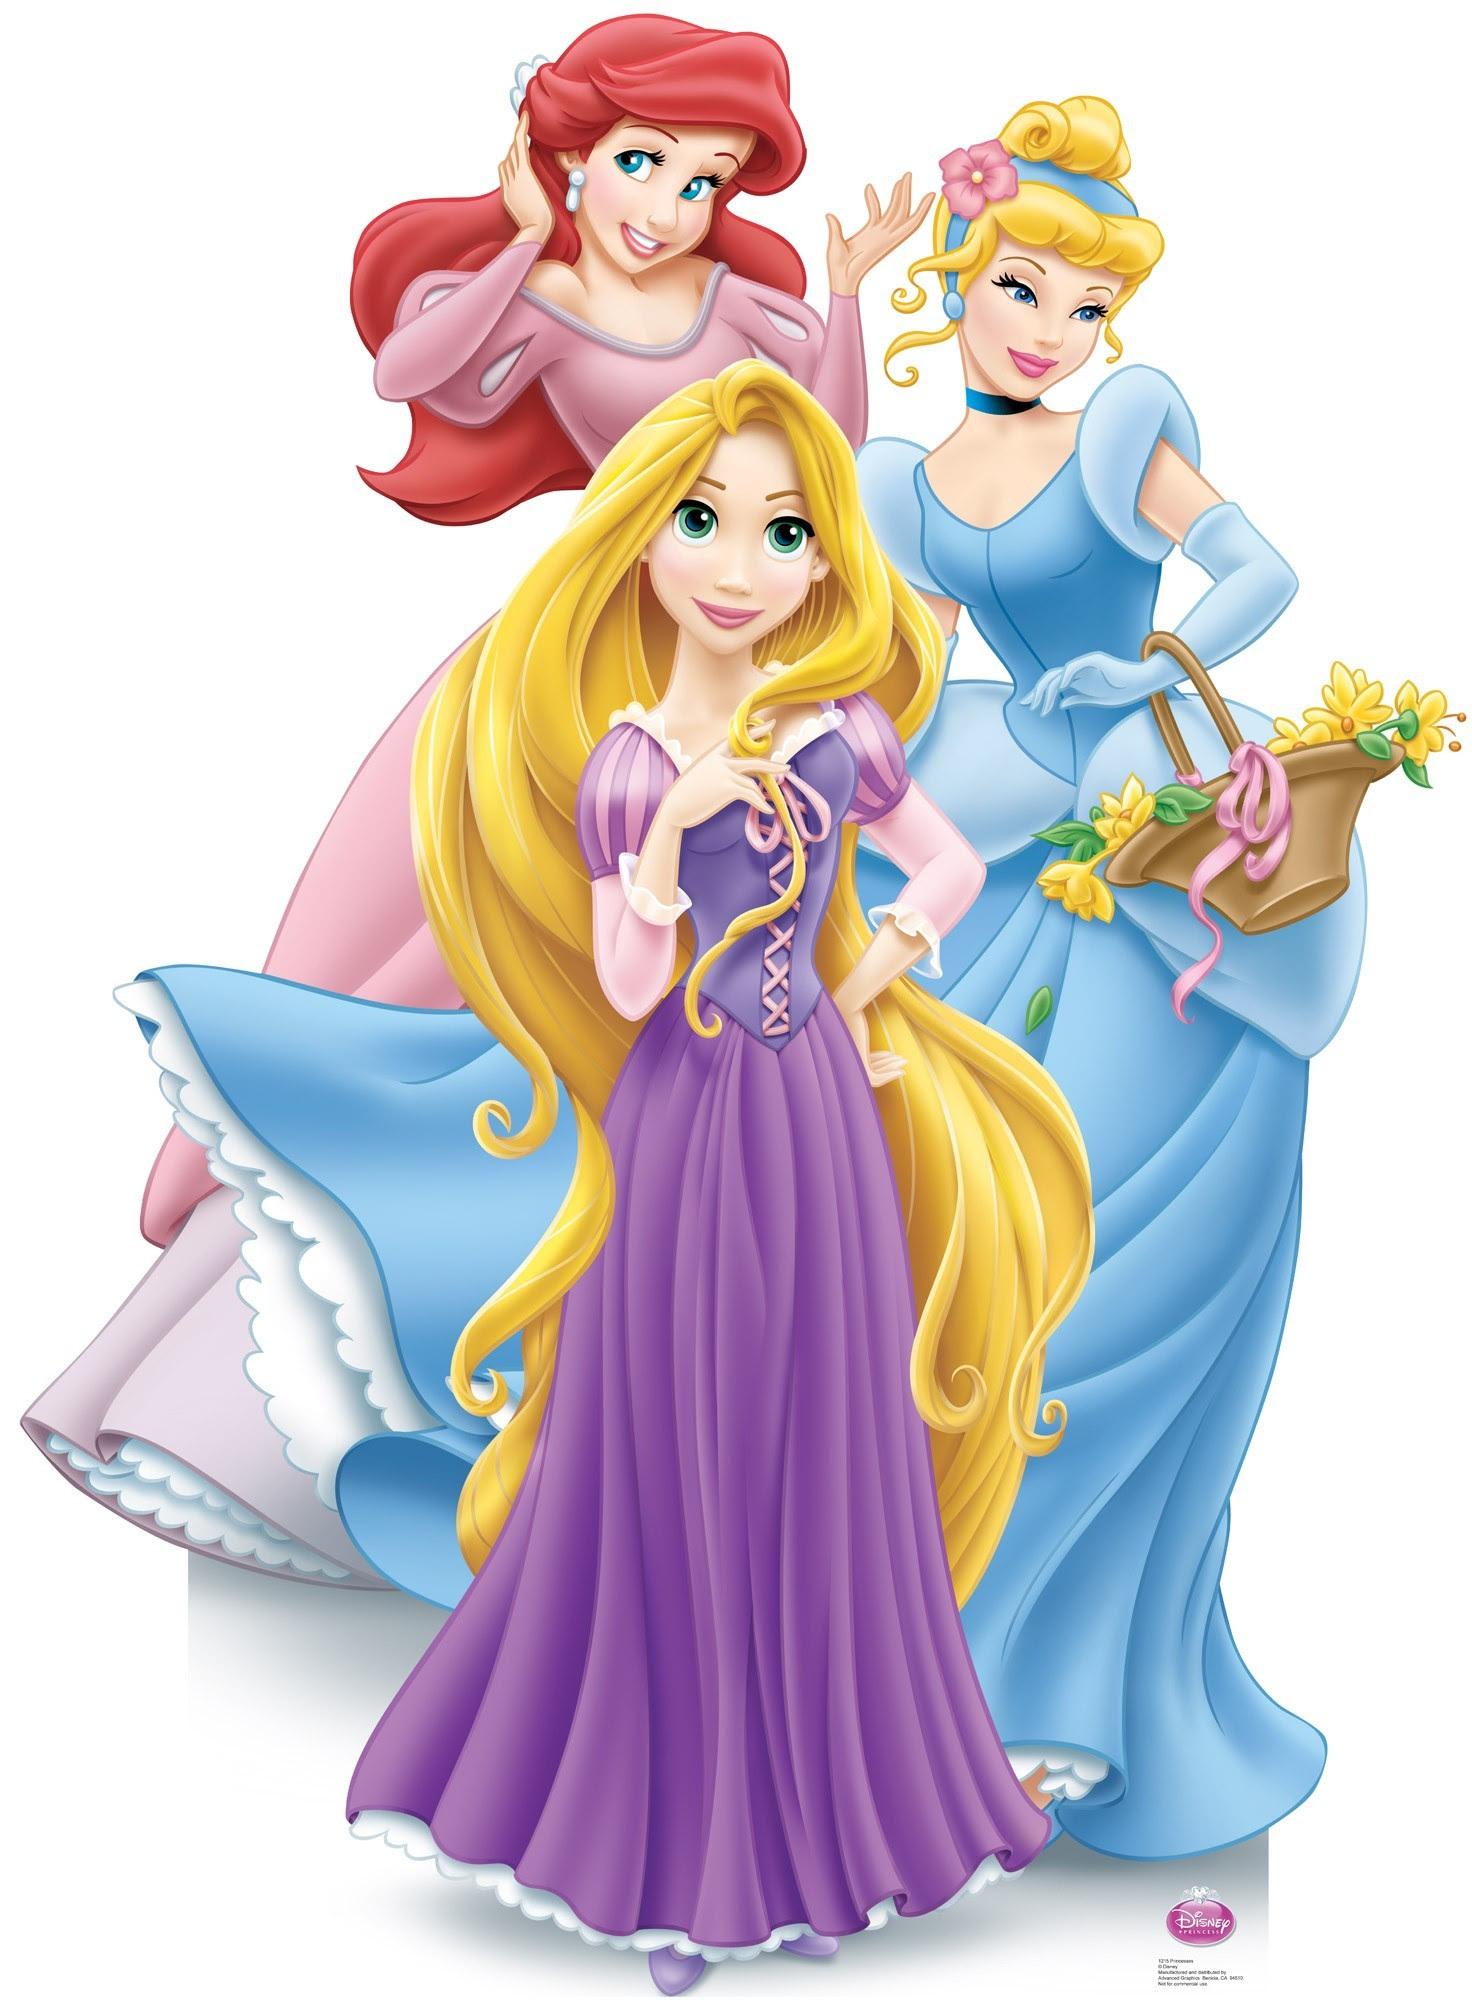 Disney Princess Backgrounds (57+ images)